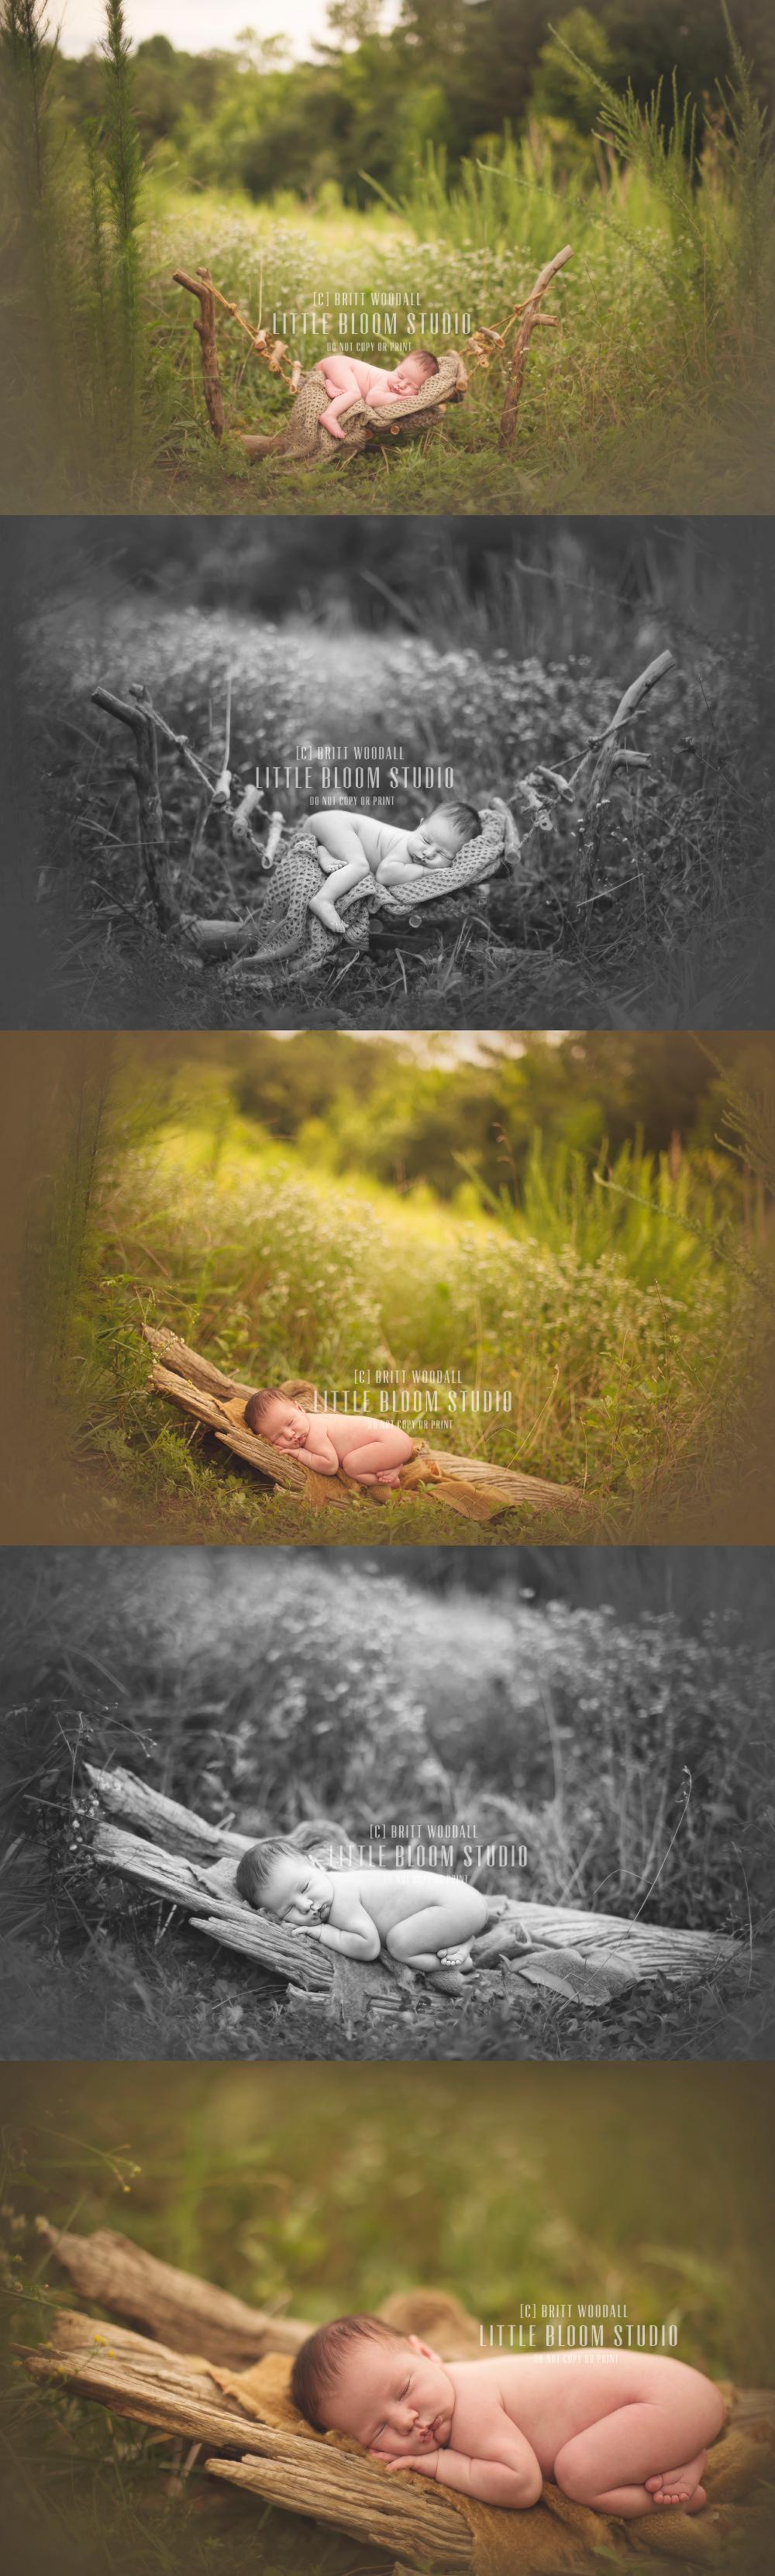 CHARLOTTE_NEWBORN_PHOTOGRAPHY.jpg